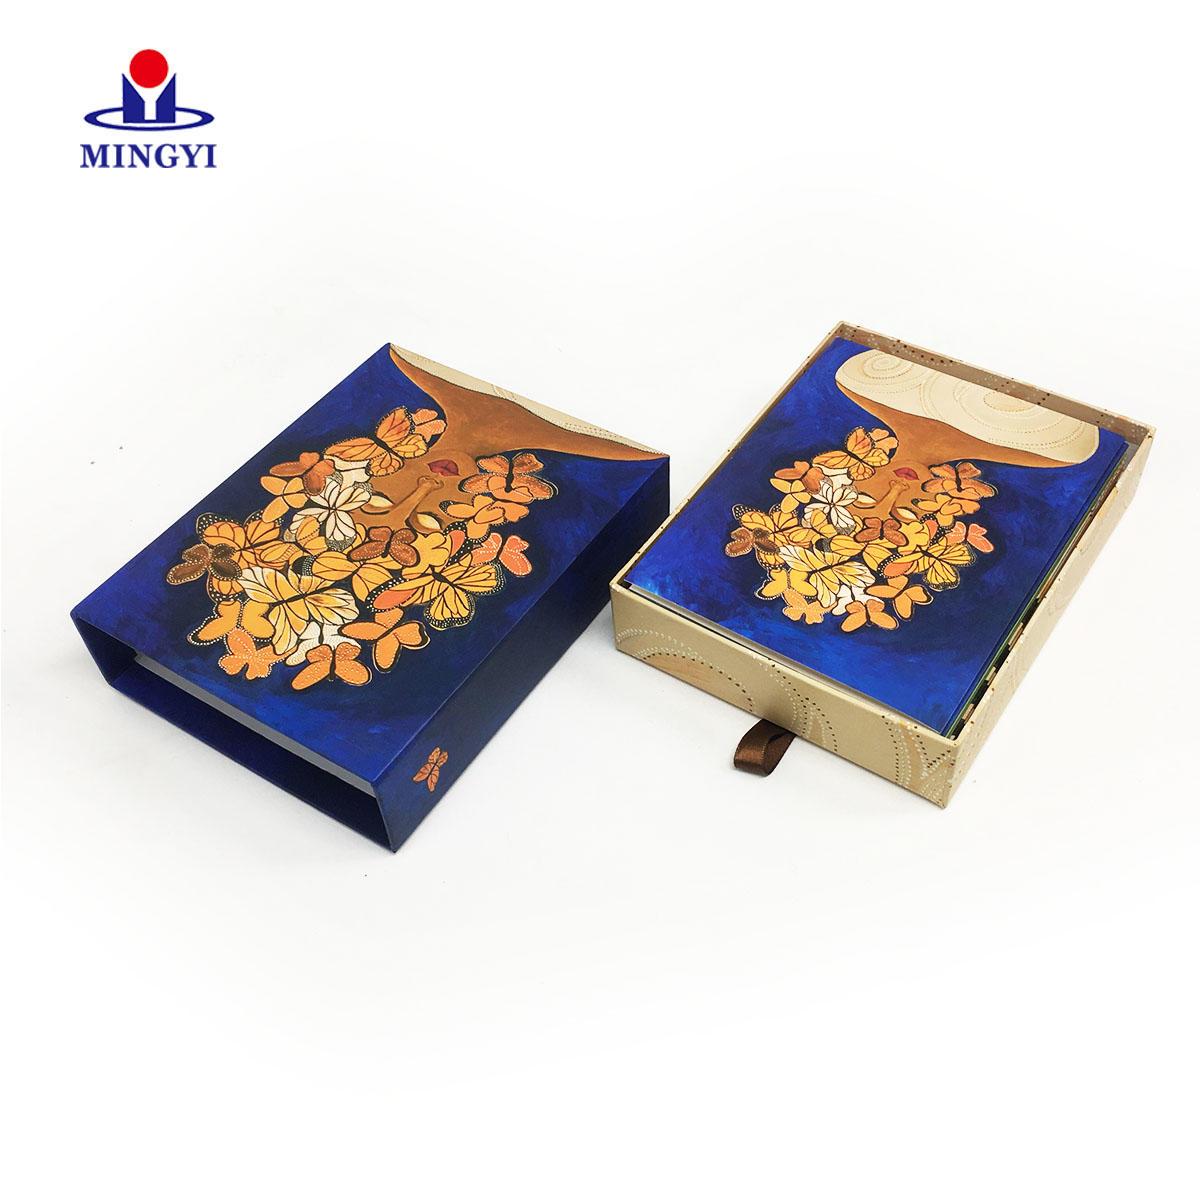 hard gift boxes commodity souvenirs Bulk Buy clothing daily Mingyi Printing